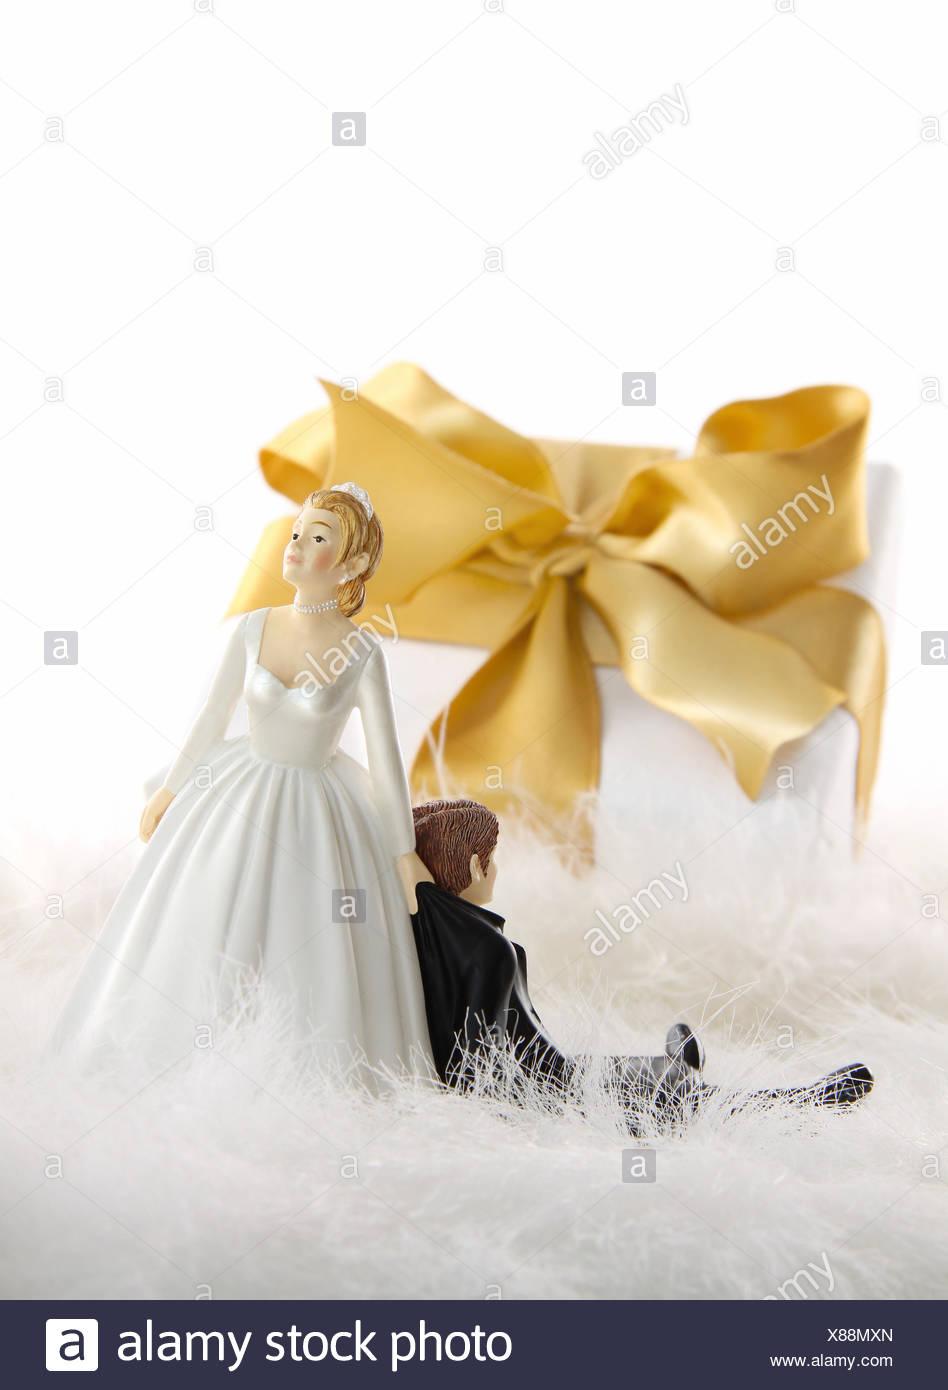 Wedding Cake Figures Stock Photos & Wedding Cake Figures Stock ...